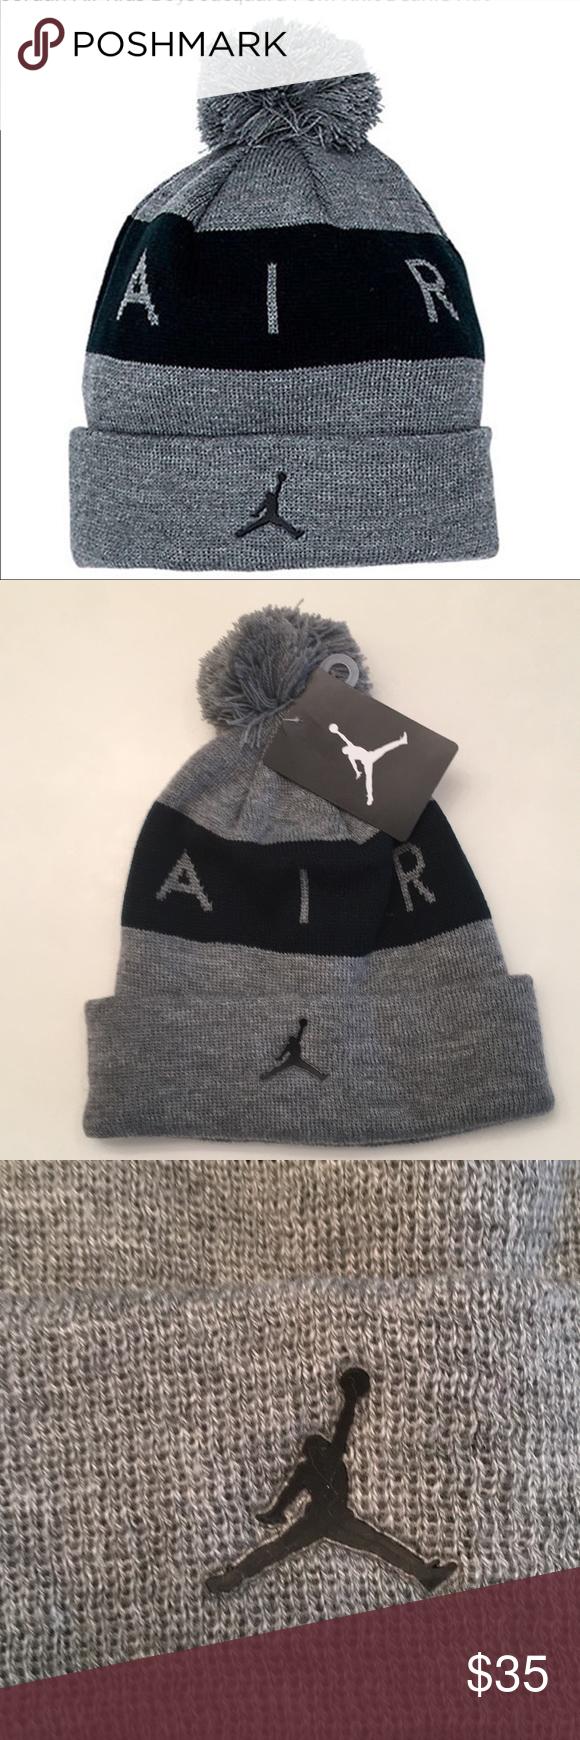 c70c1869034ef Jordan Kids Beanie Hat The classic knit hat gets the Air Jordan treatment  on the Kids